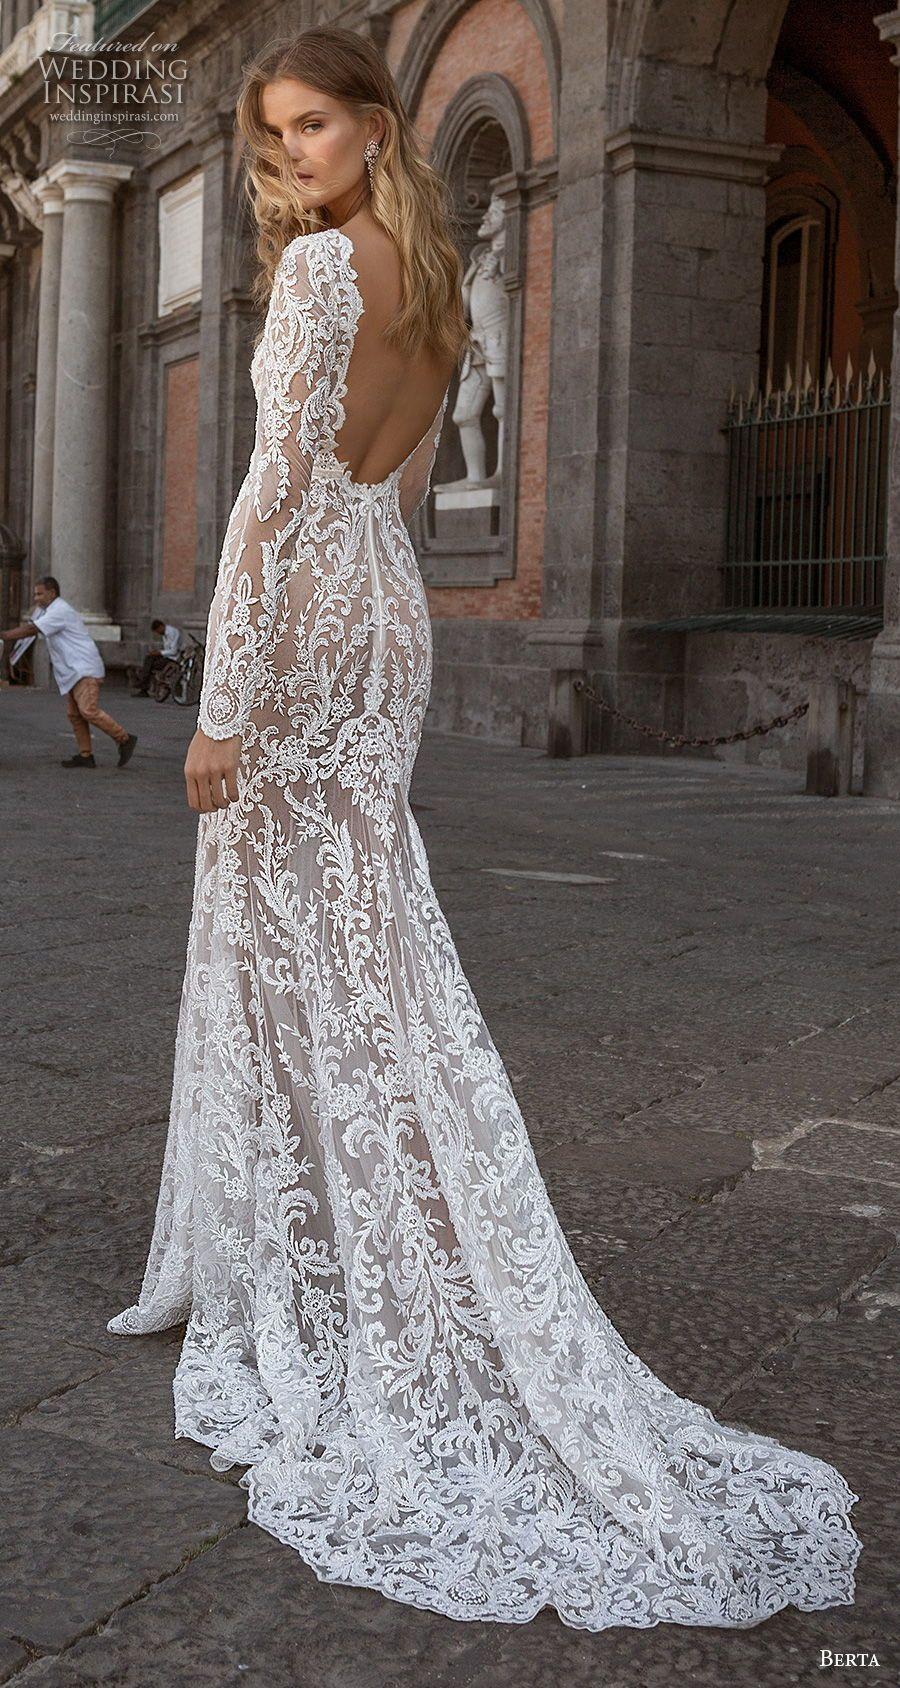 Berta Fall 2020 Wedding Dresses Napoli Bridal Collection Wedding Inspirasi Long Sleeve Wedding Dress Lace Lace Wedding Dress With Sleeves Berta Wedding Dress [ 1688 x 900 Pixel ]